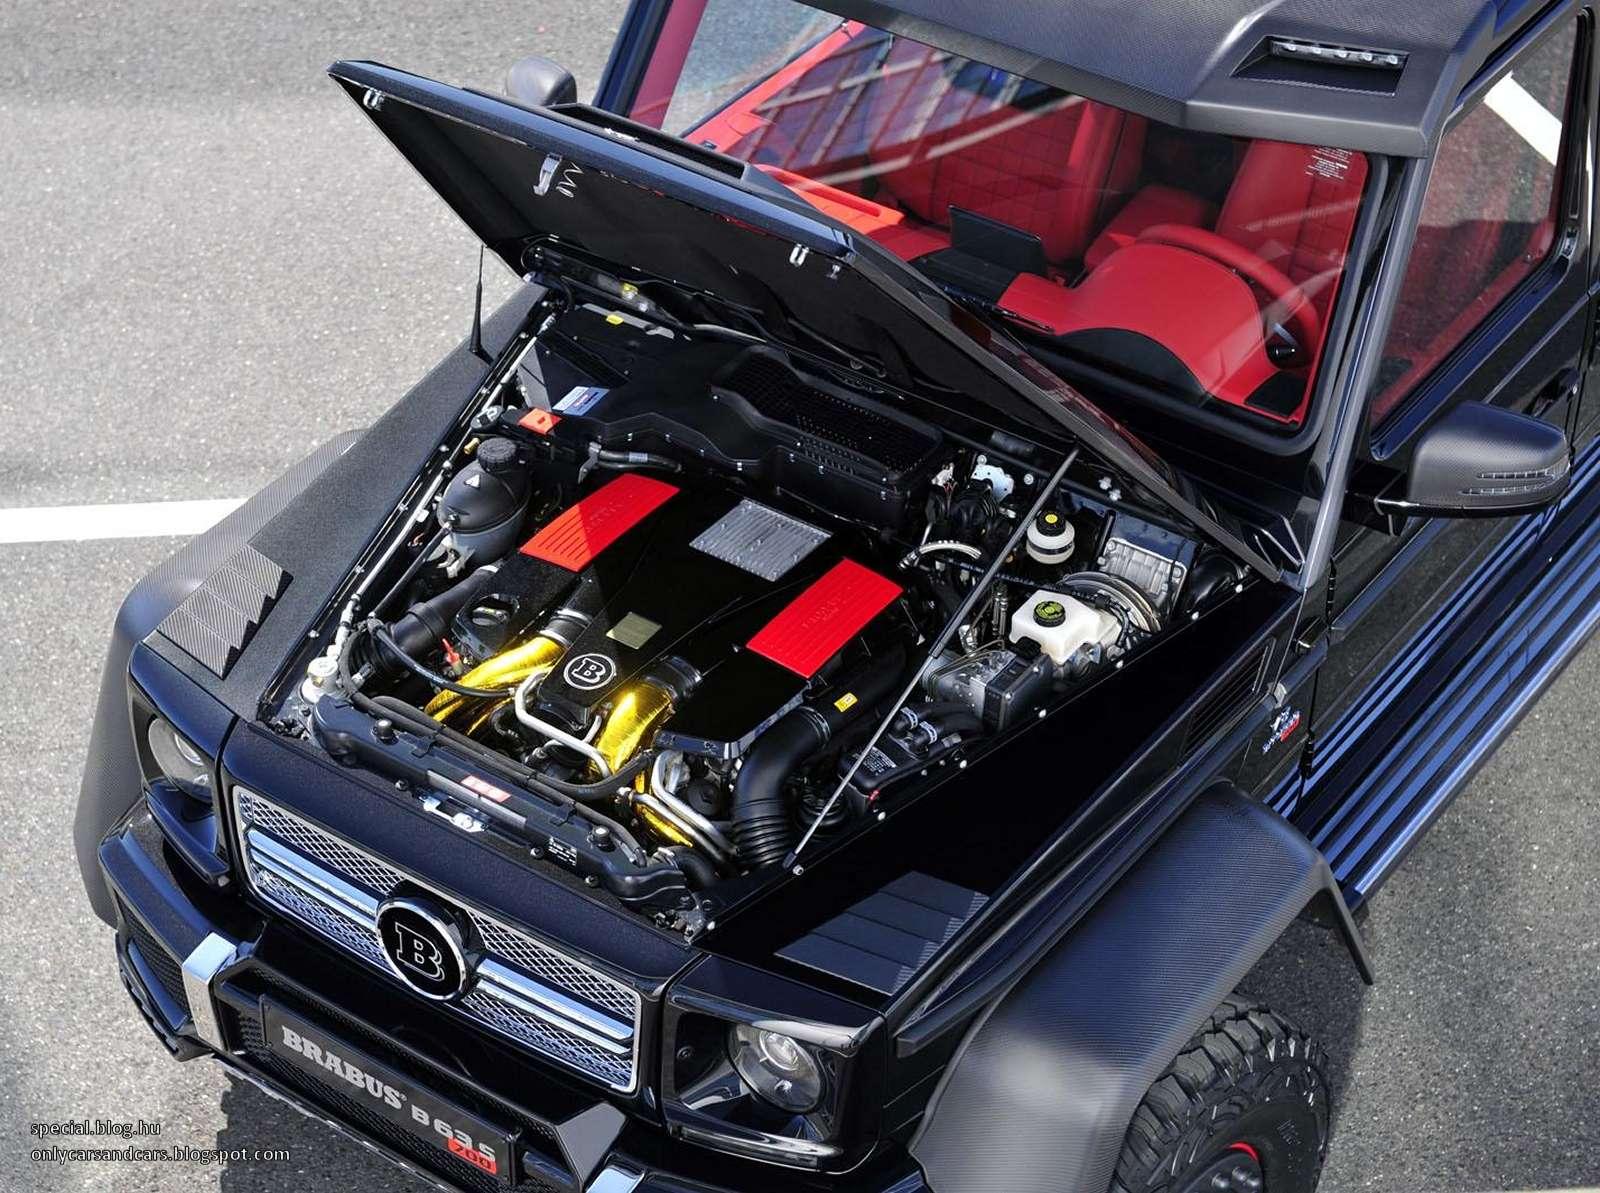 New engine offers v8 biturbo power